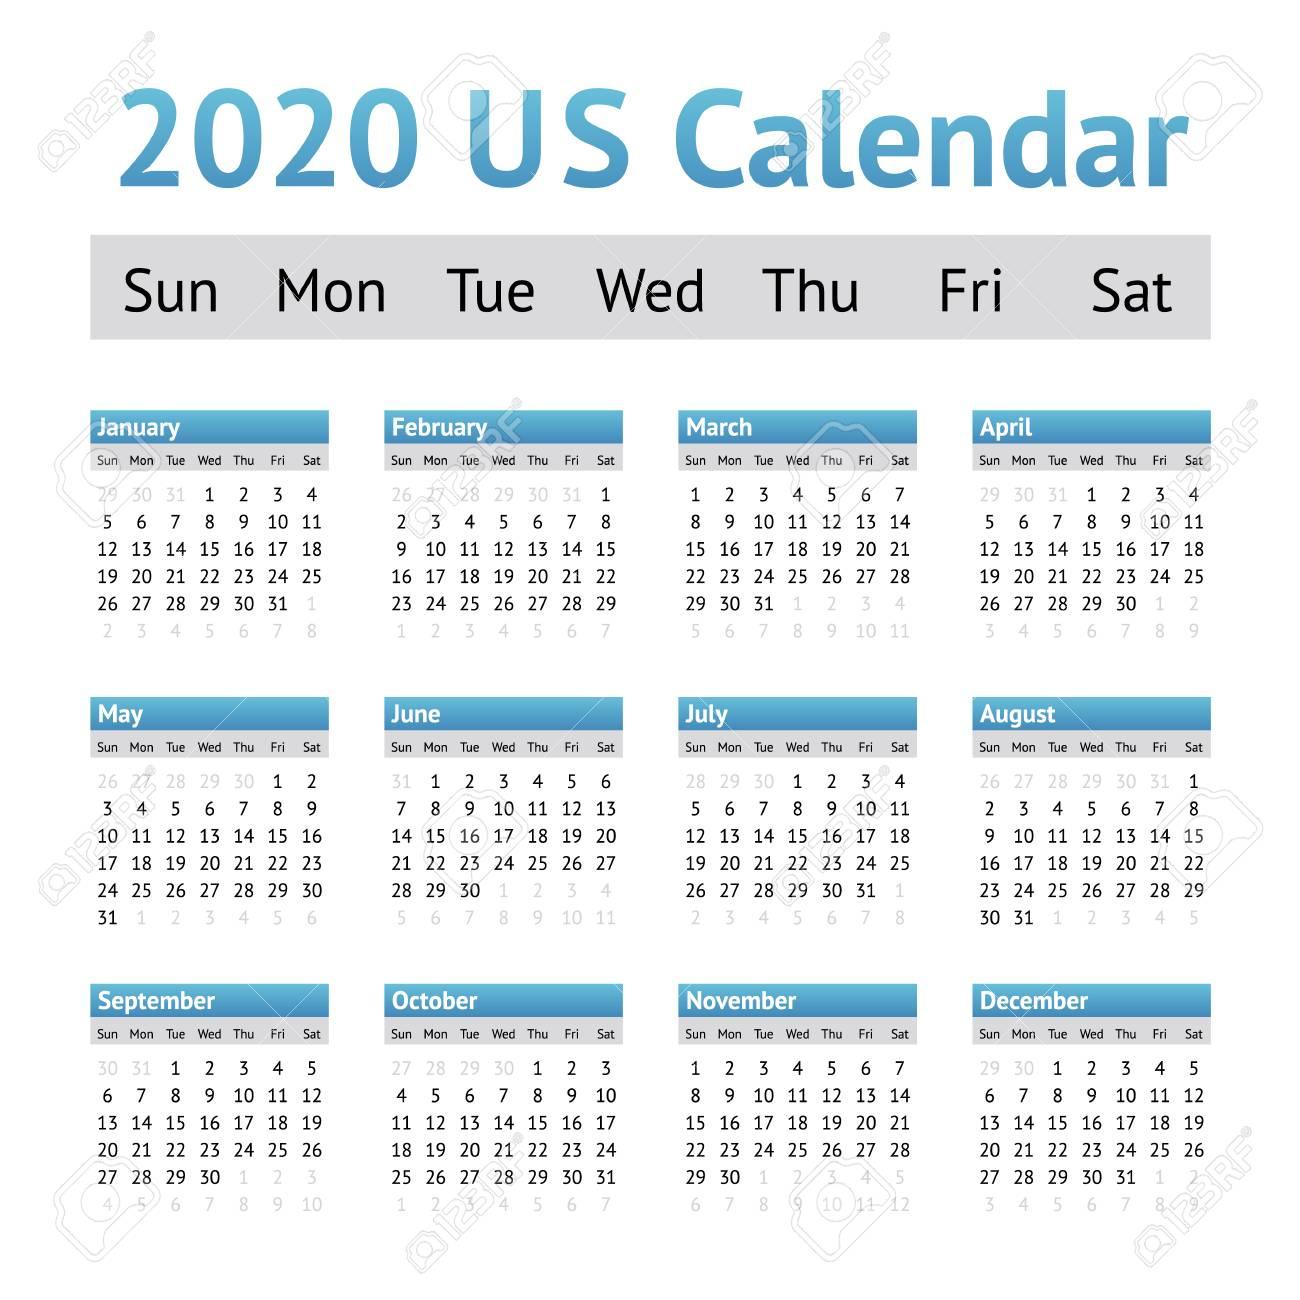 2020 Calendar Us - Wpa.wpart.co